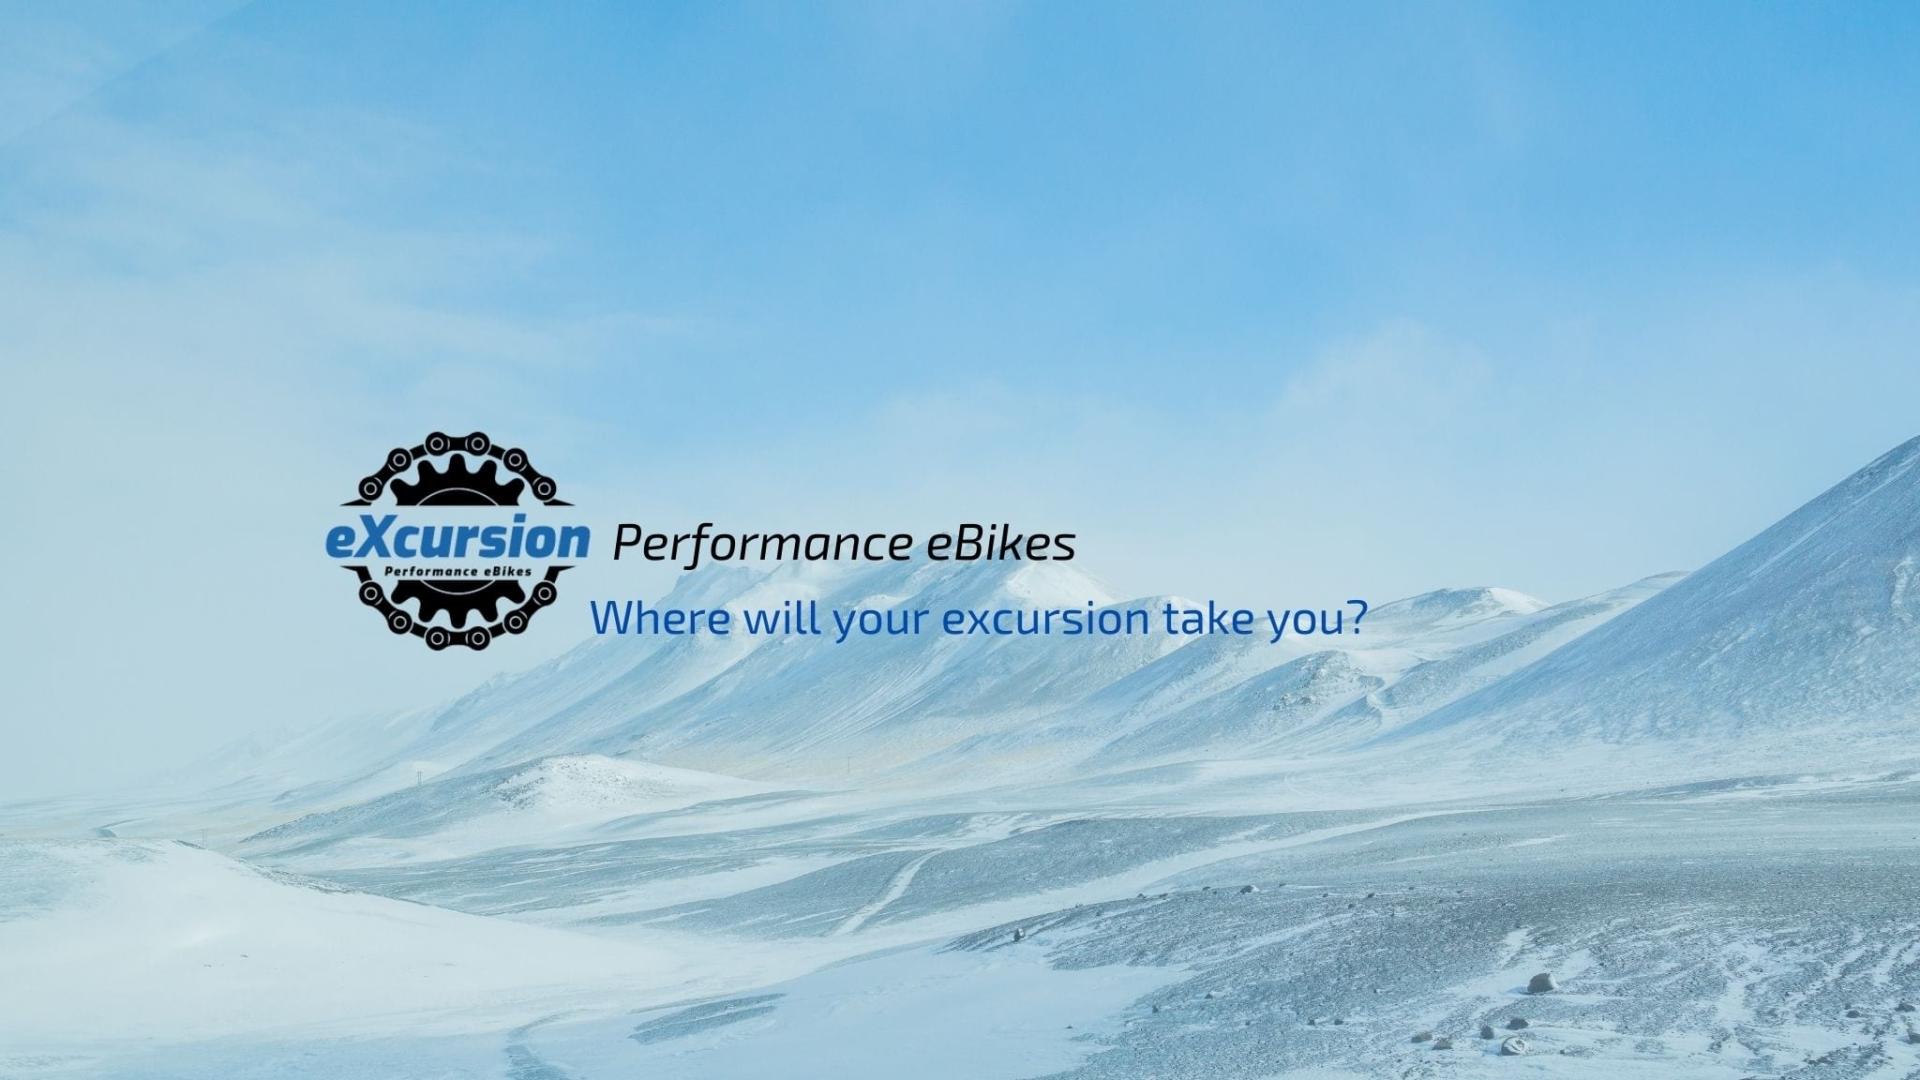 eXcursion Performance eBikes